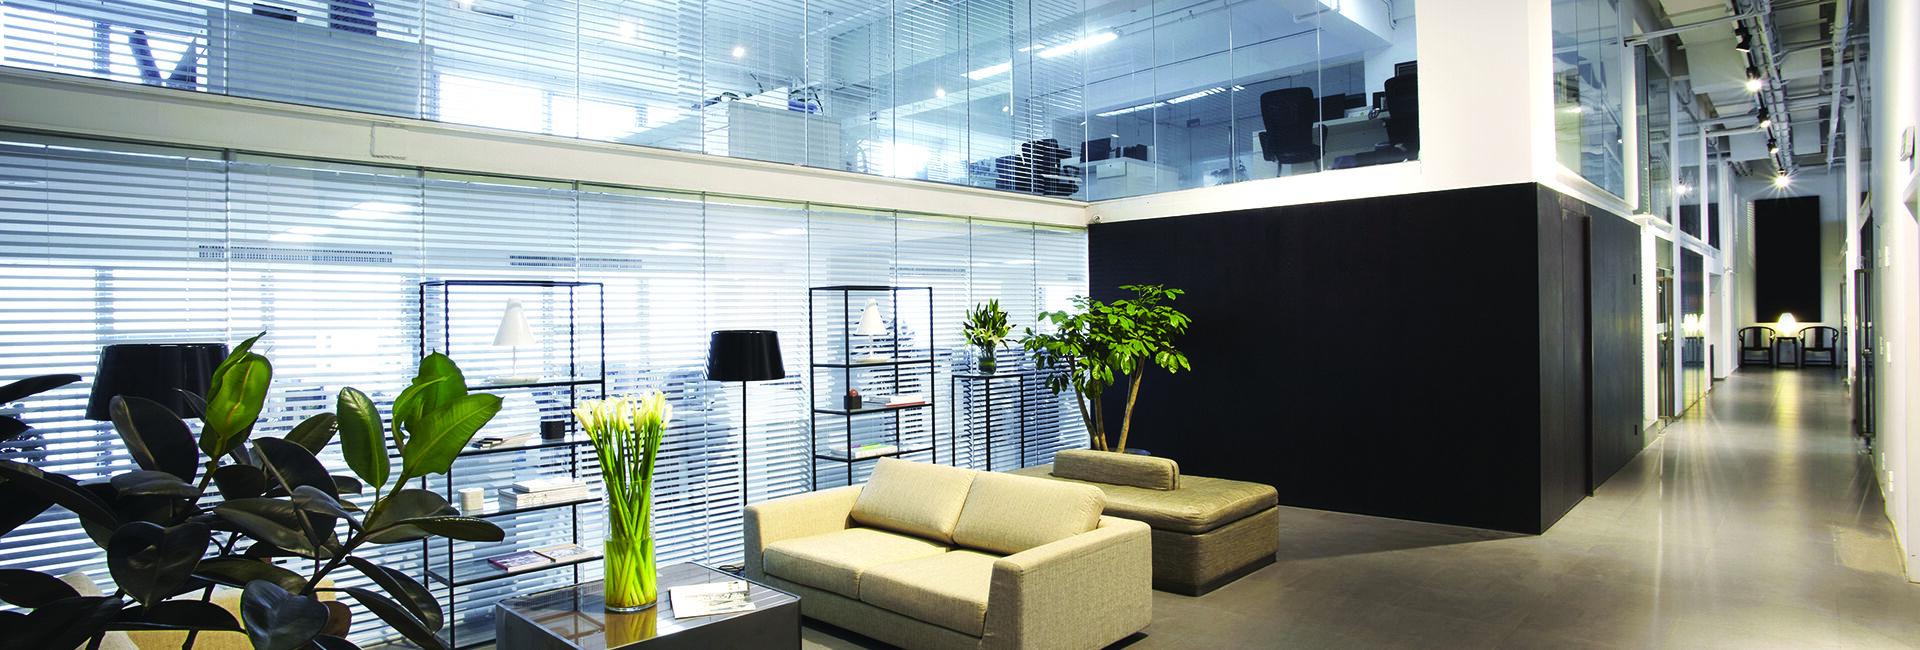 Blueair  Improve office air quality  office-air-quality-banner